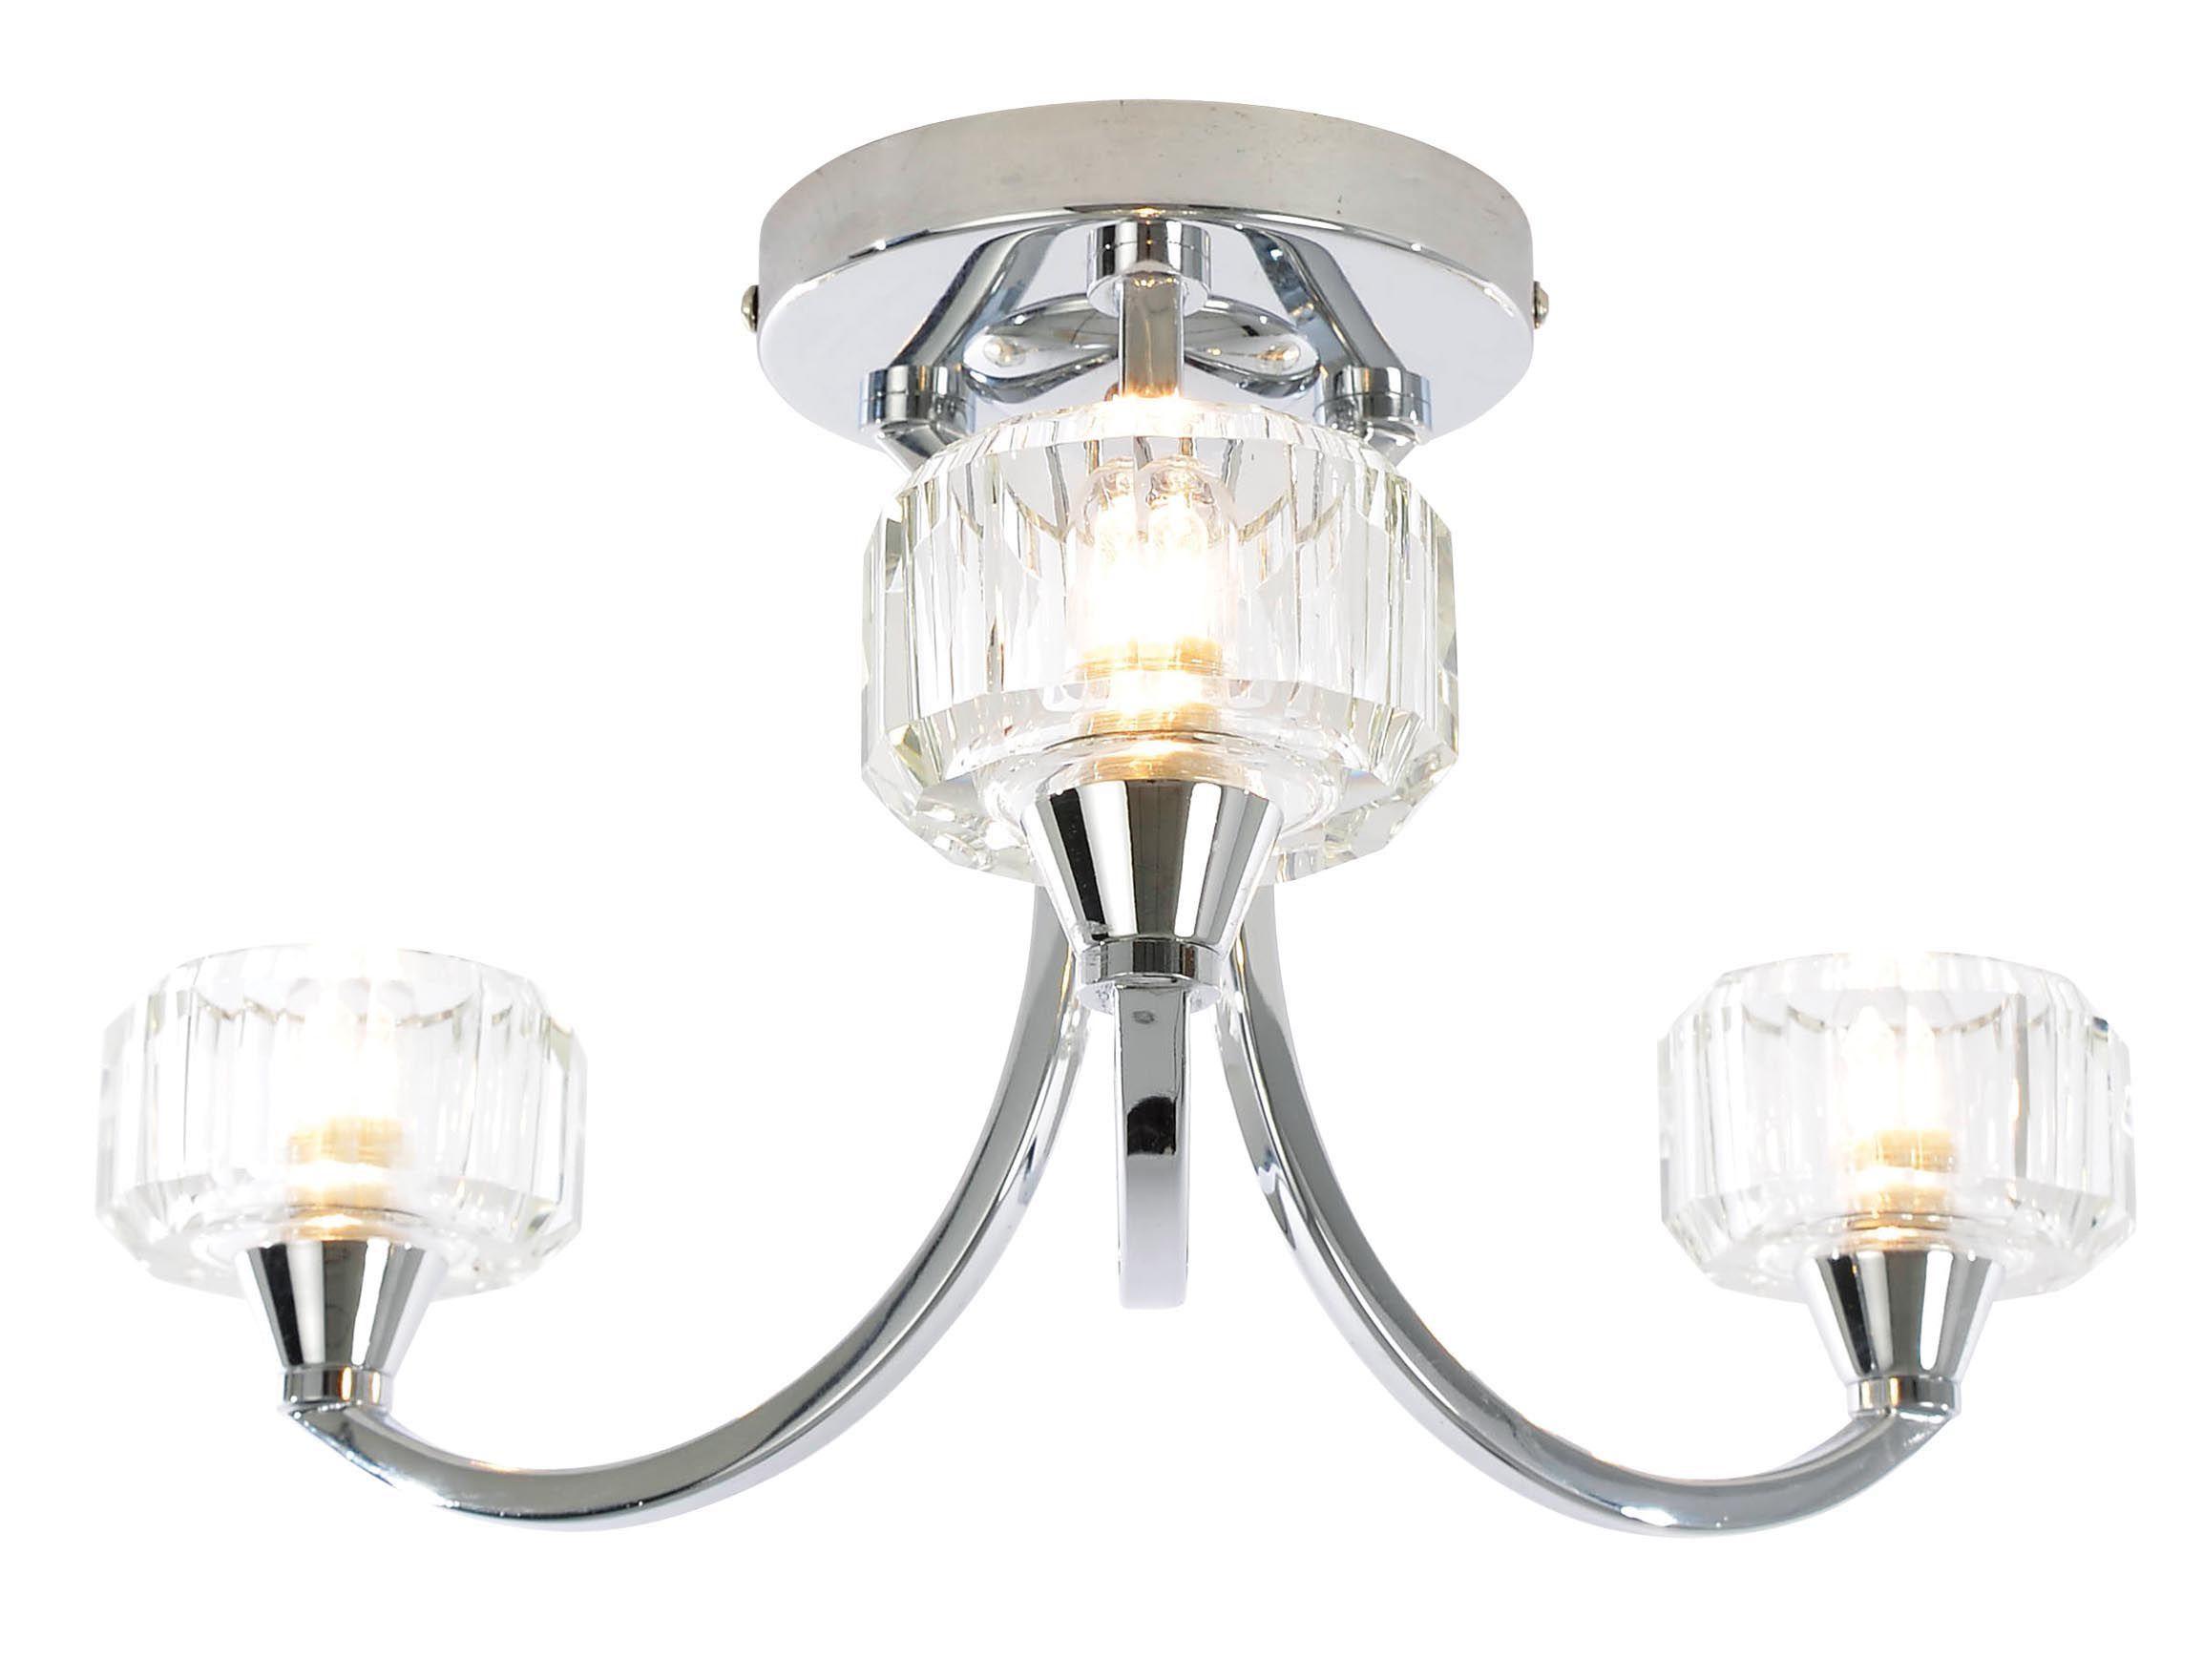 Ceiling Light Fittings Diy : Orara clear chrome effect lamp bathroom ceiling light